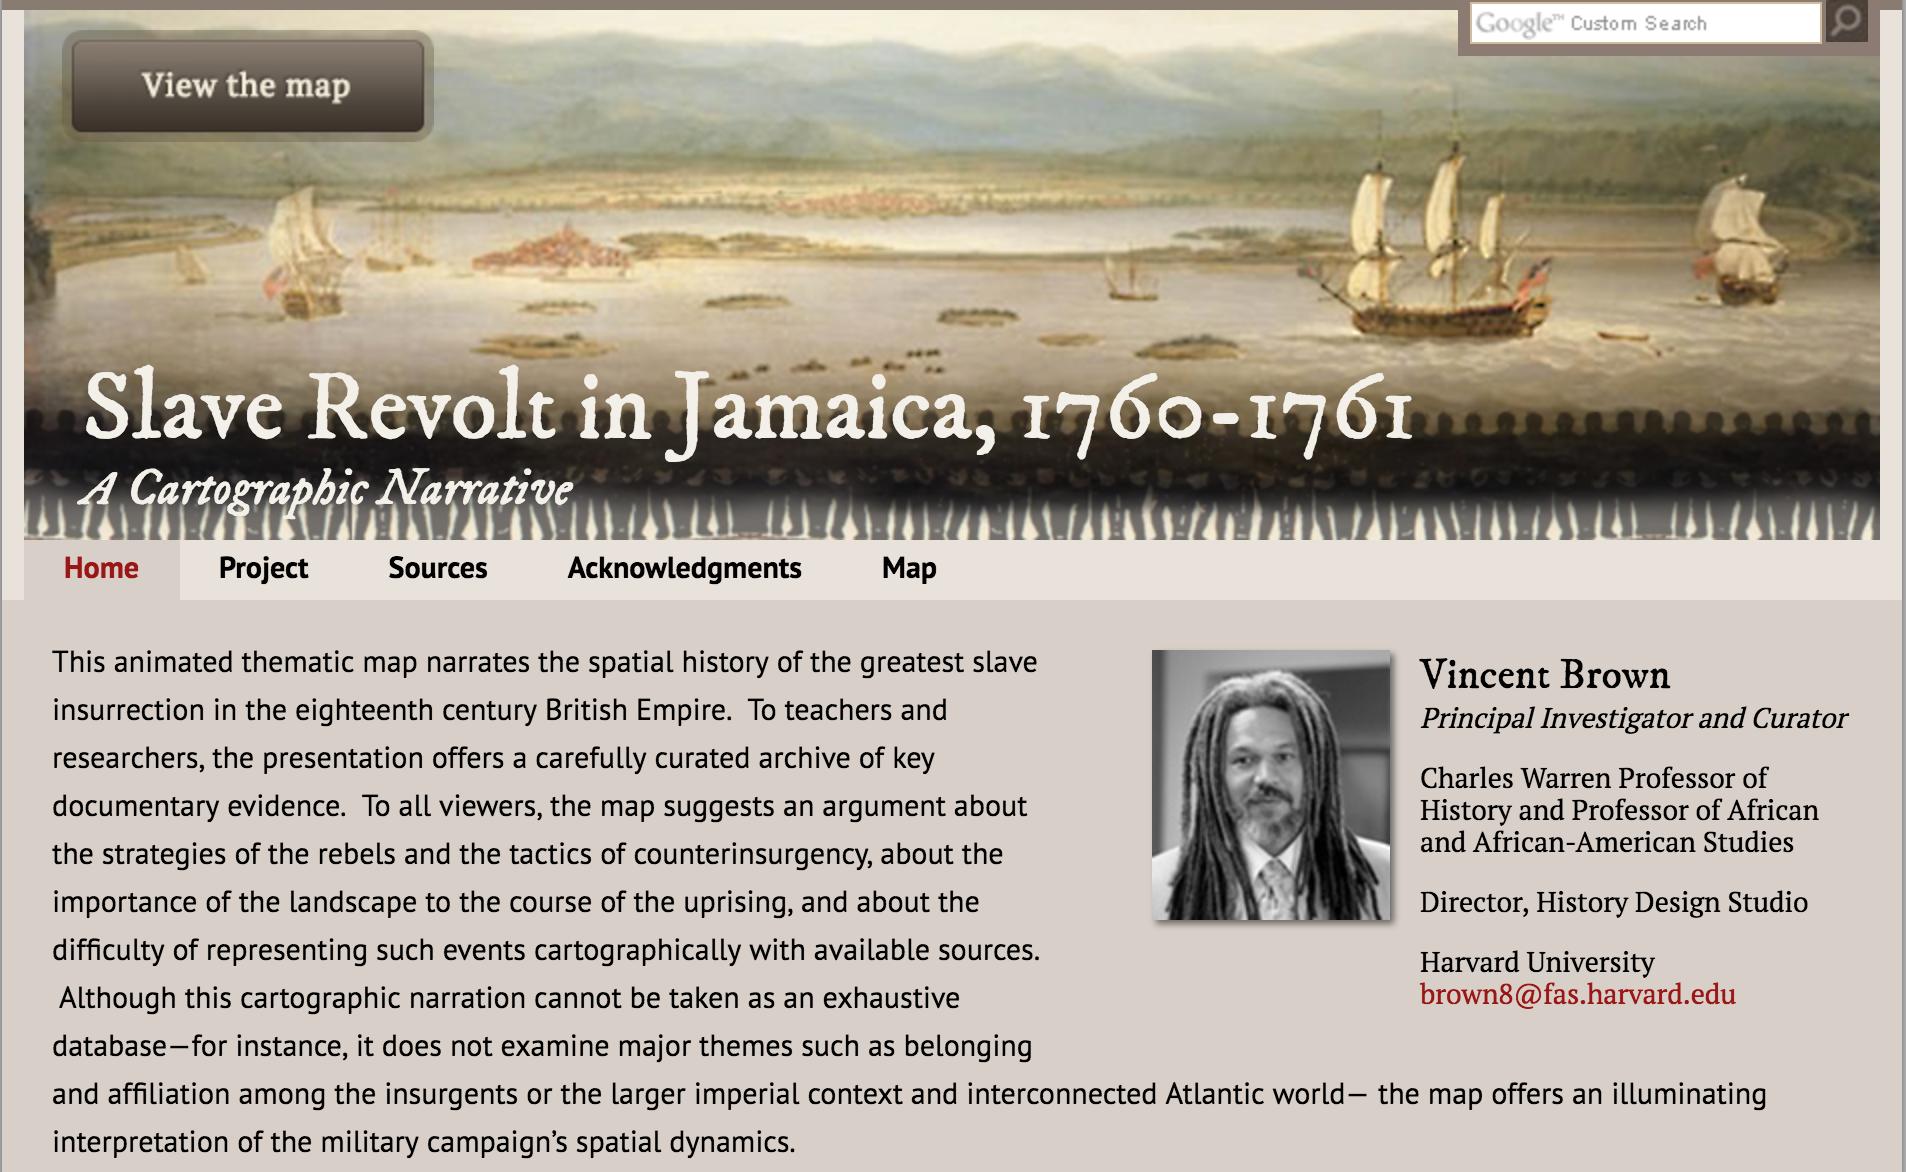 Slave_Revolt_in_Jamaica__1760-1761